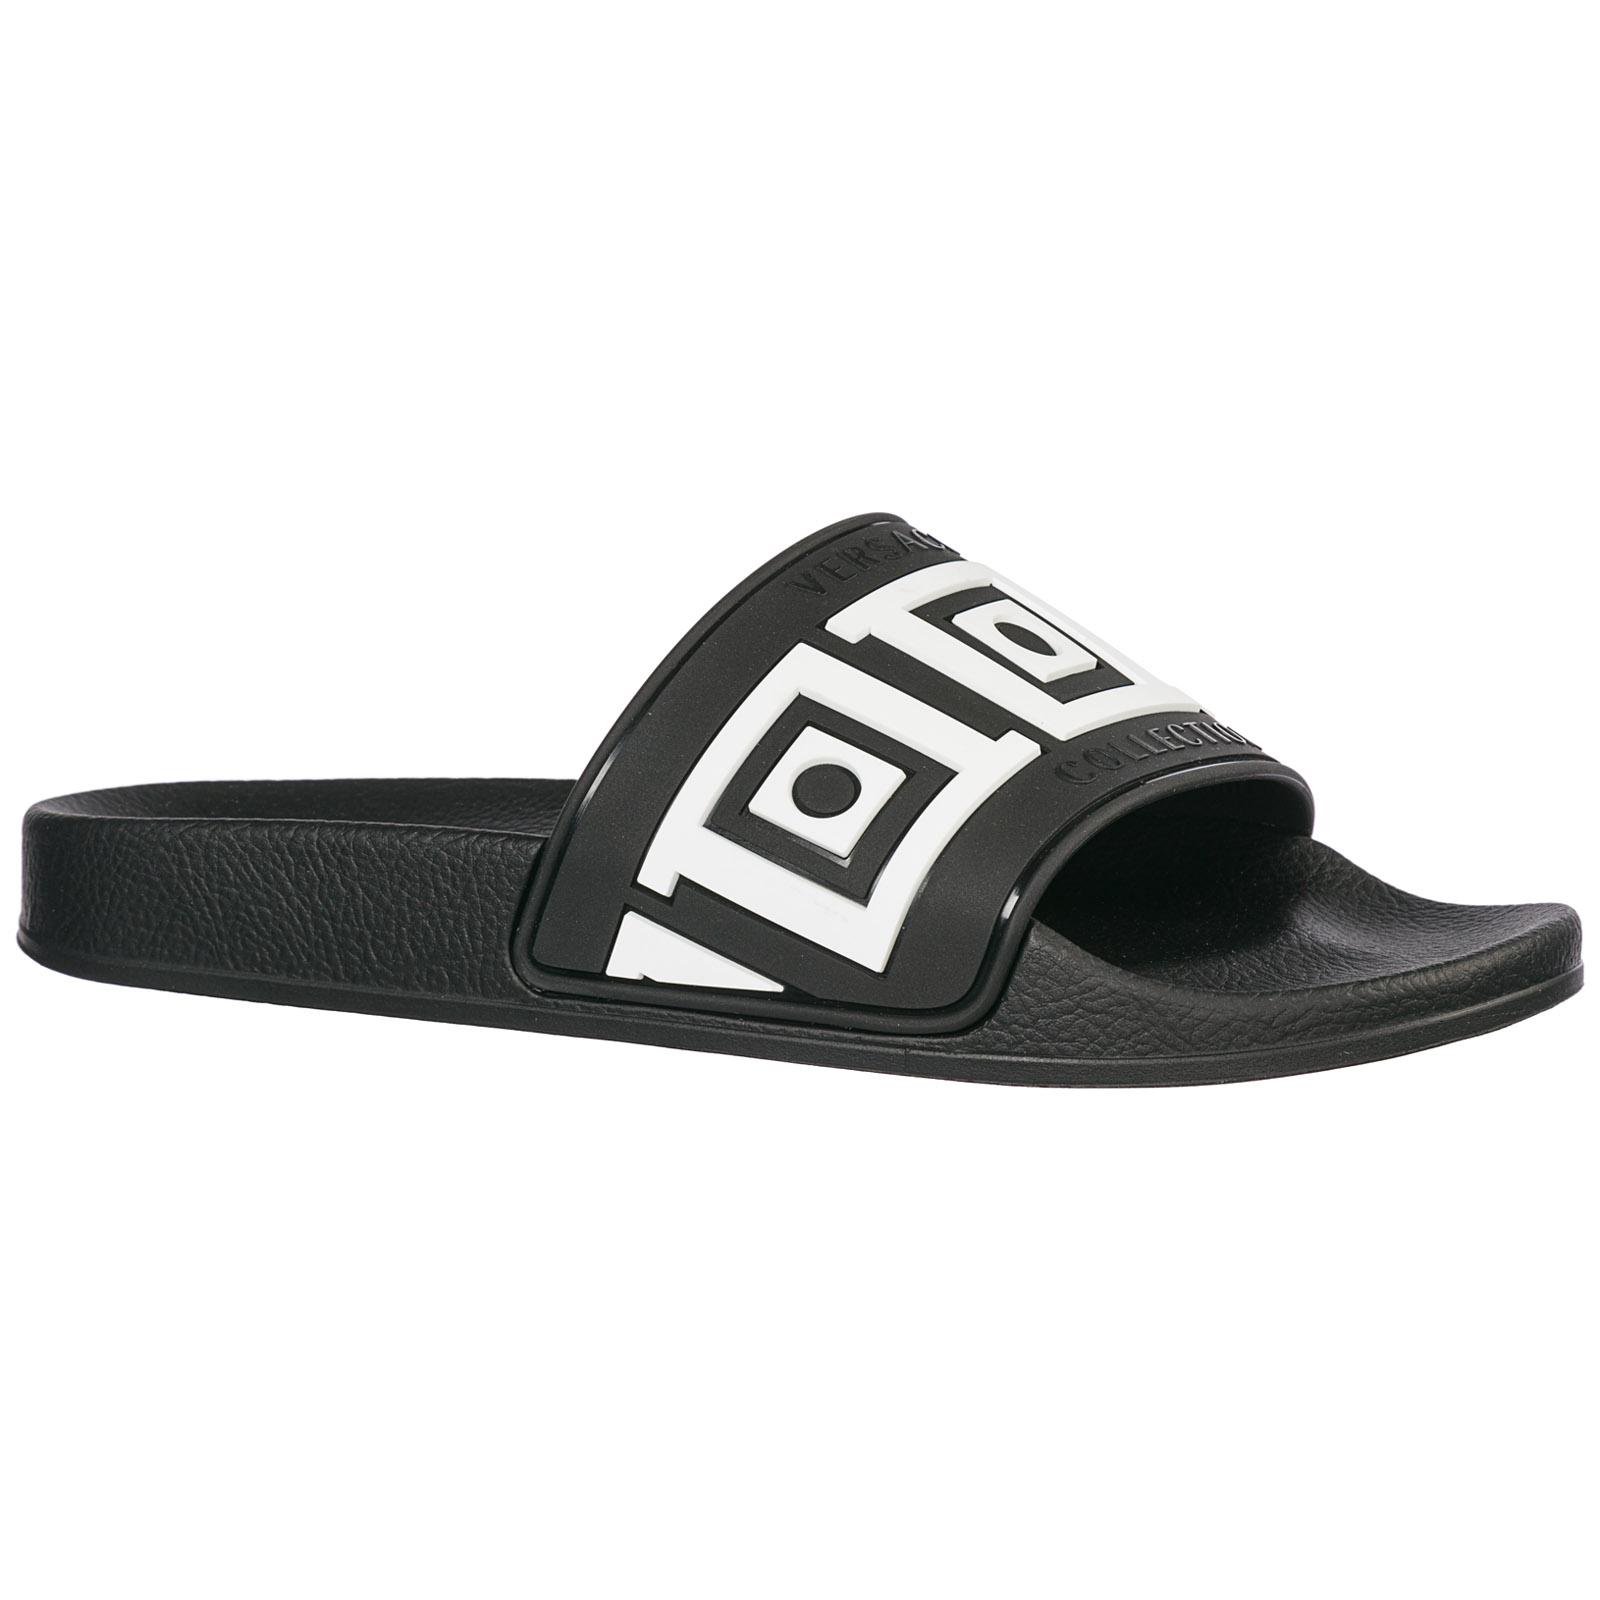 26b5ce02ca3ae Men's slippers sandals rubber